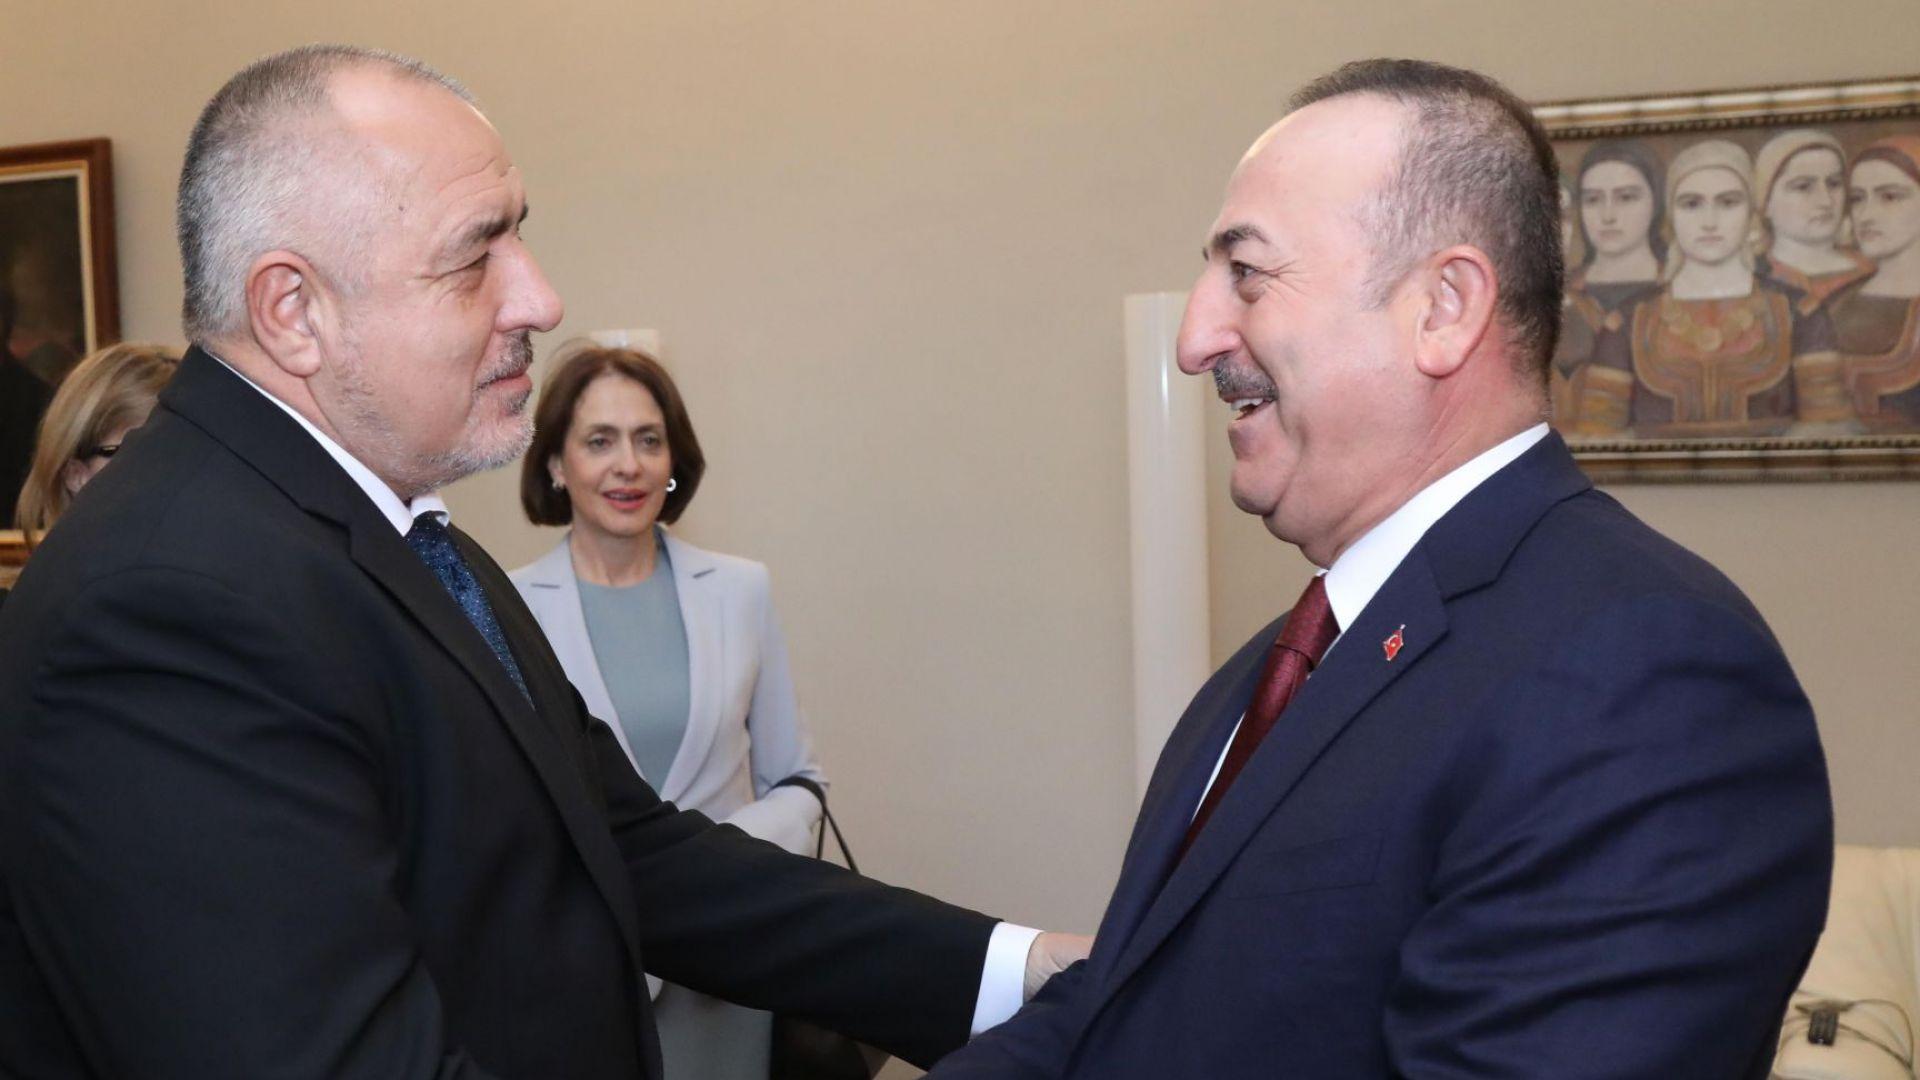 Борисов посрещна Чавушоглу и подчерта, че Турция е важен съюзник и партньор